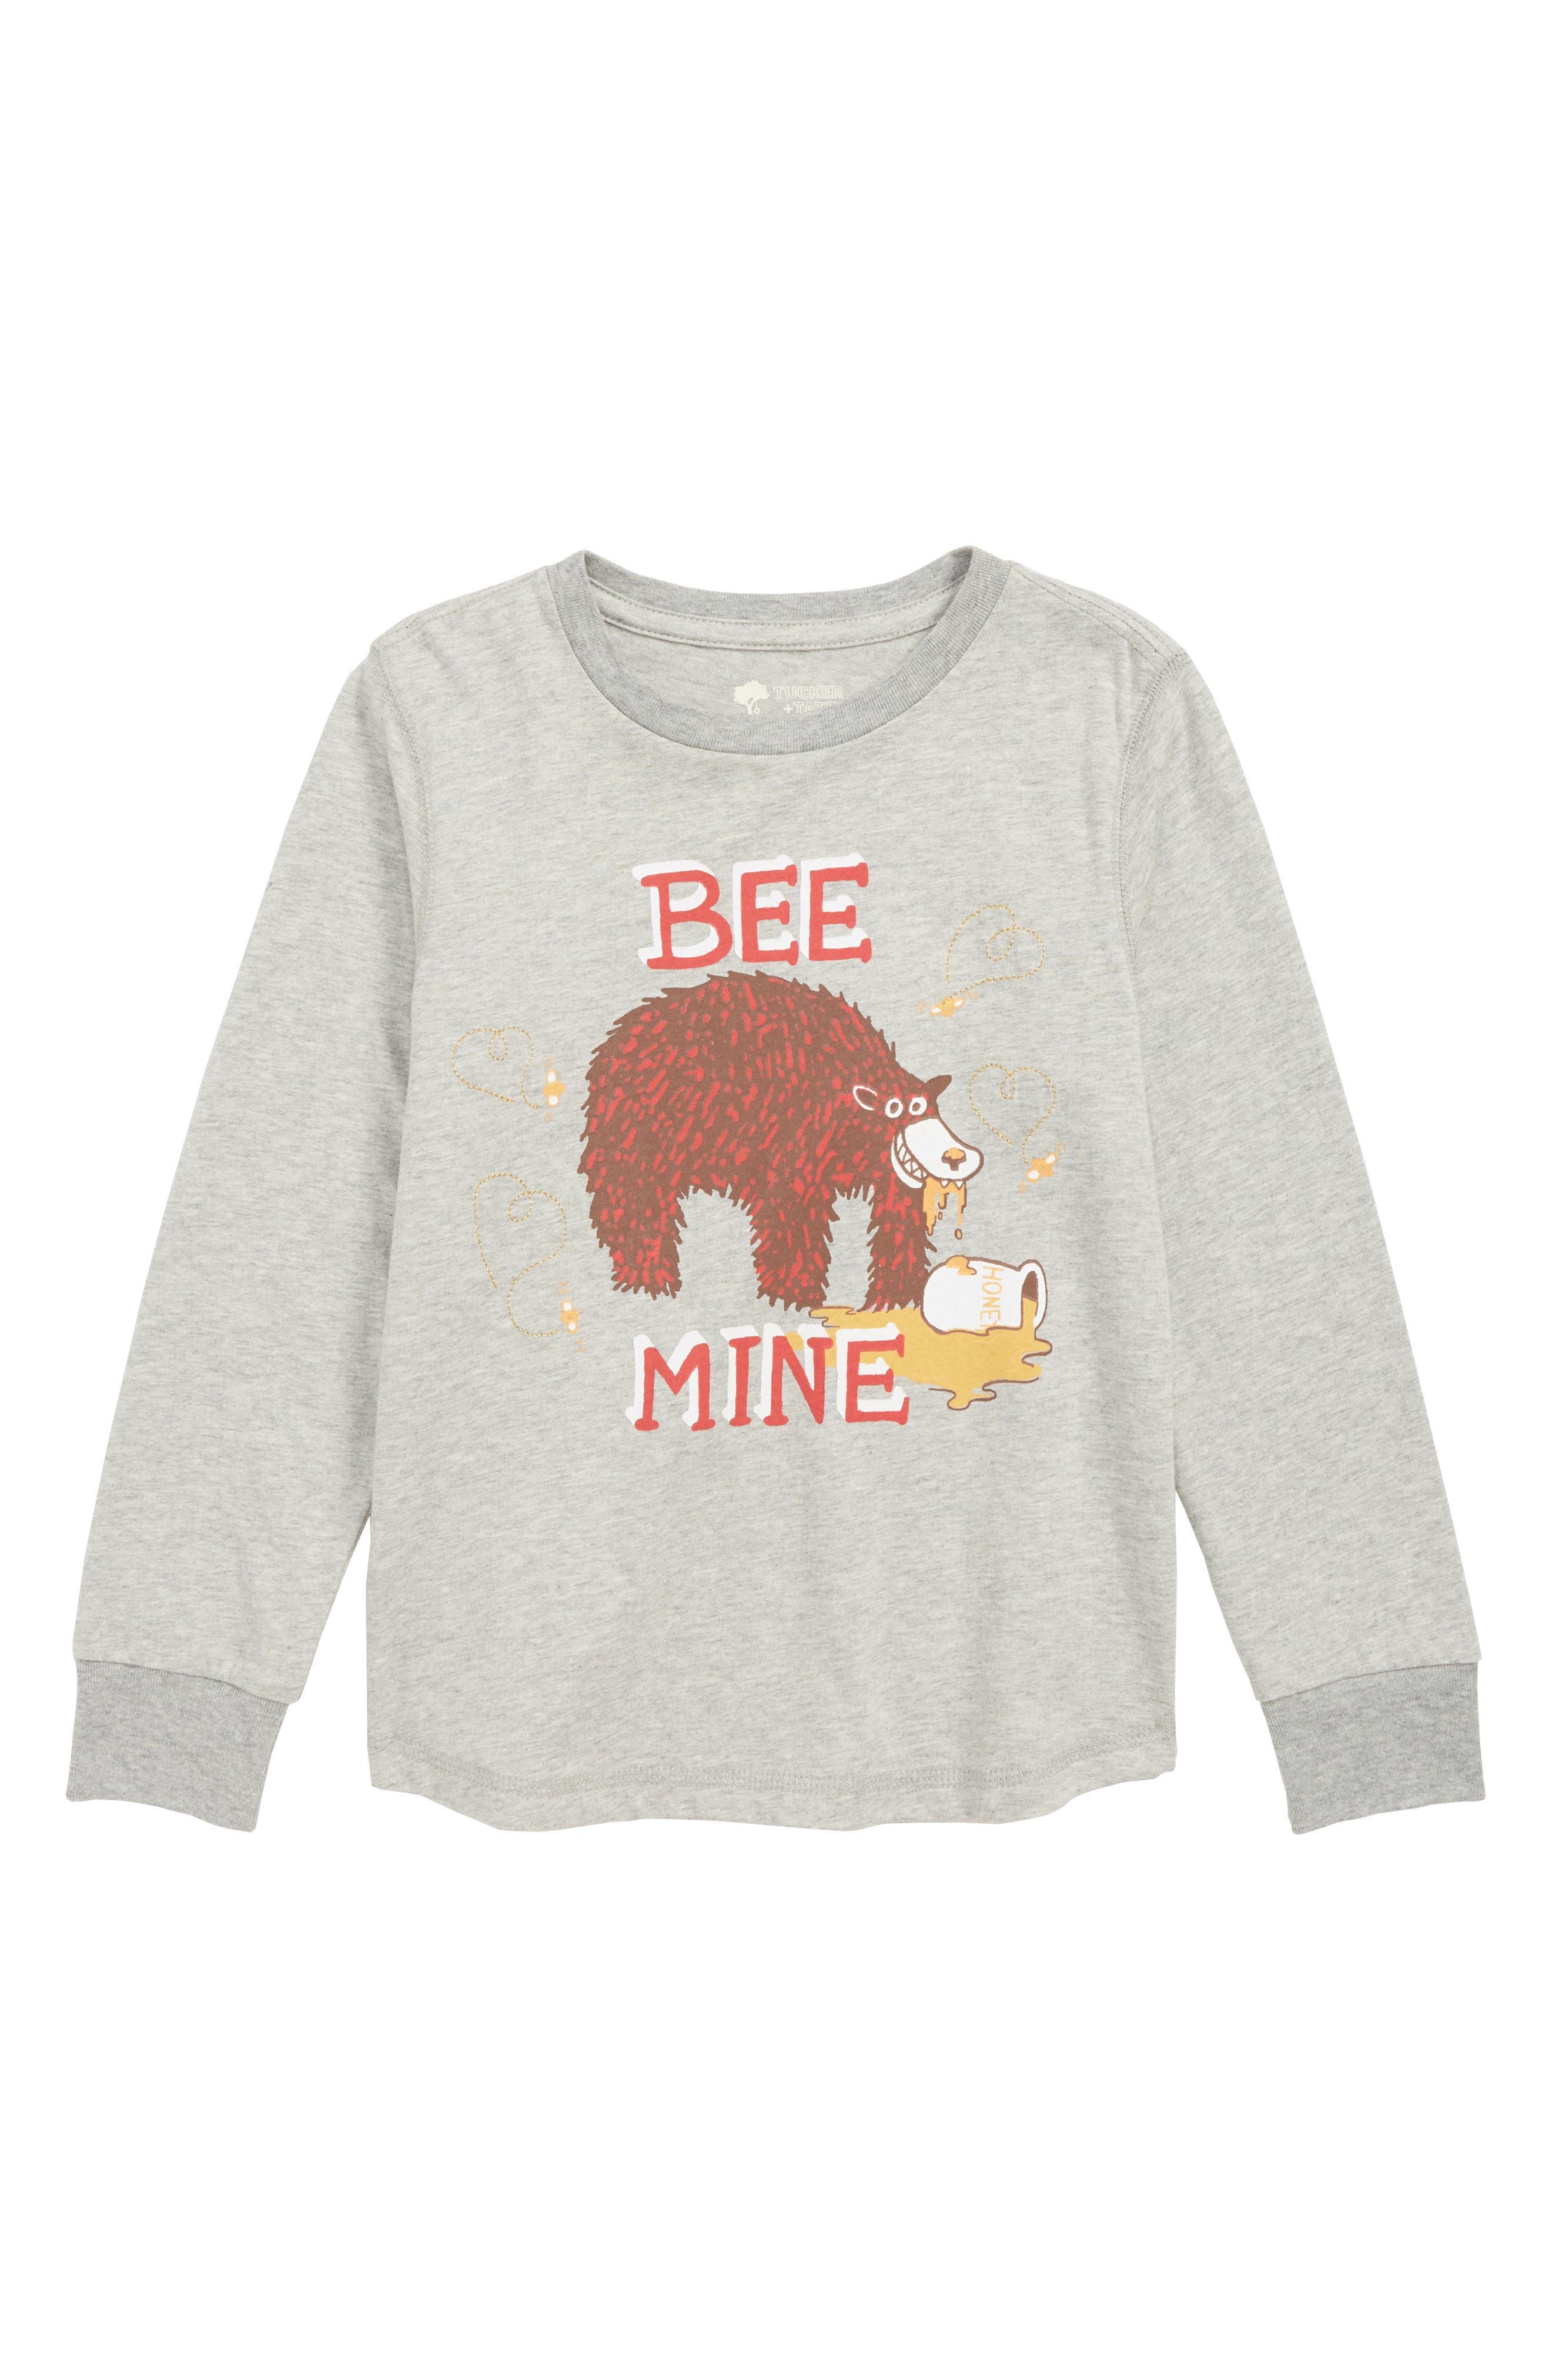 TUCKER + TATE Graphic T-Shirt, Main, color, GREY MEDIUM HEATHER BEE MINE